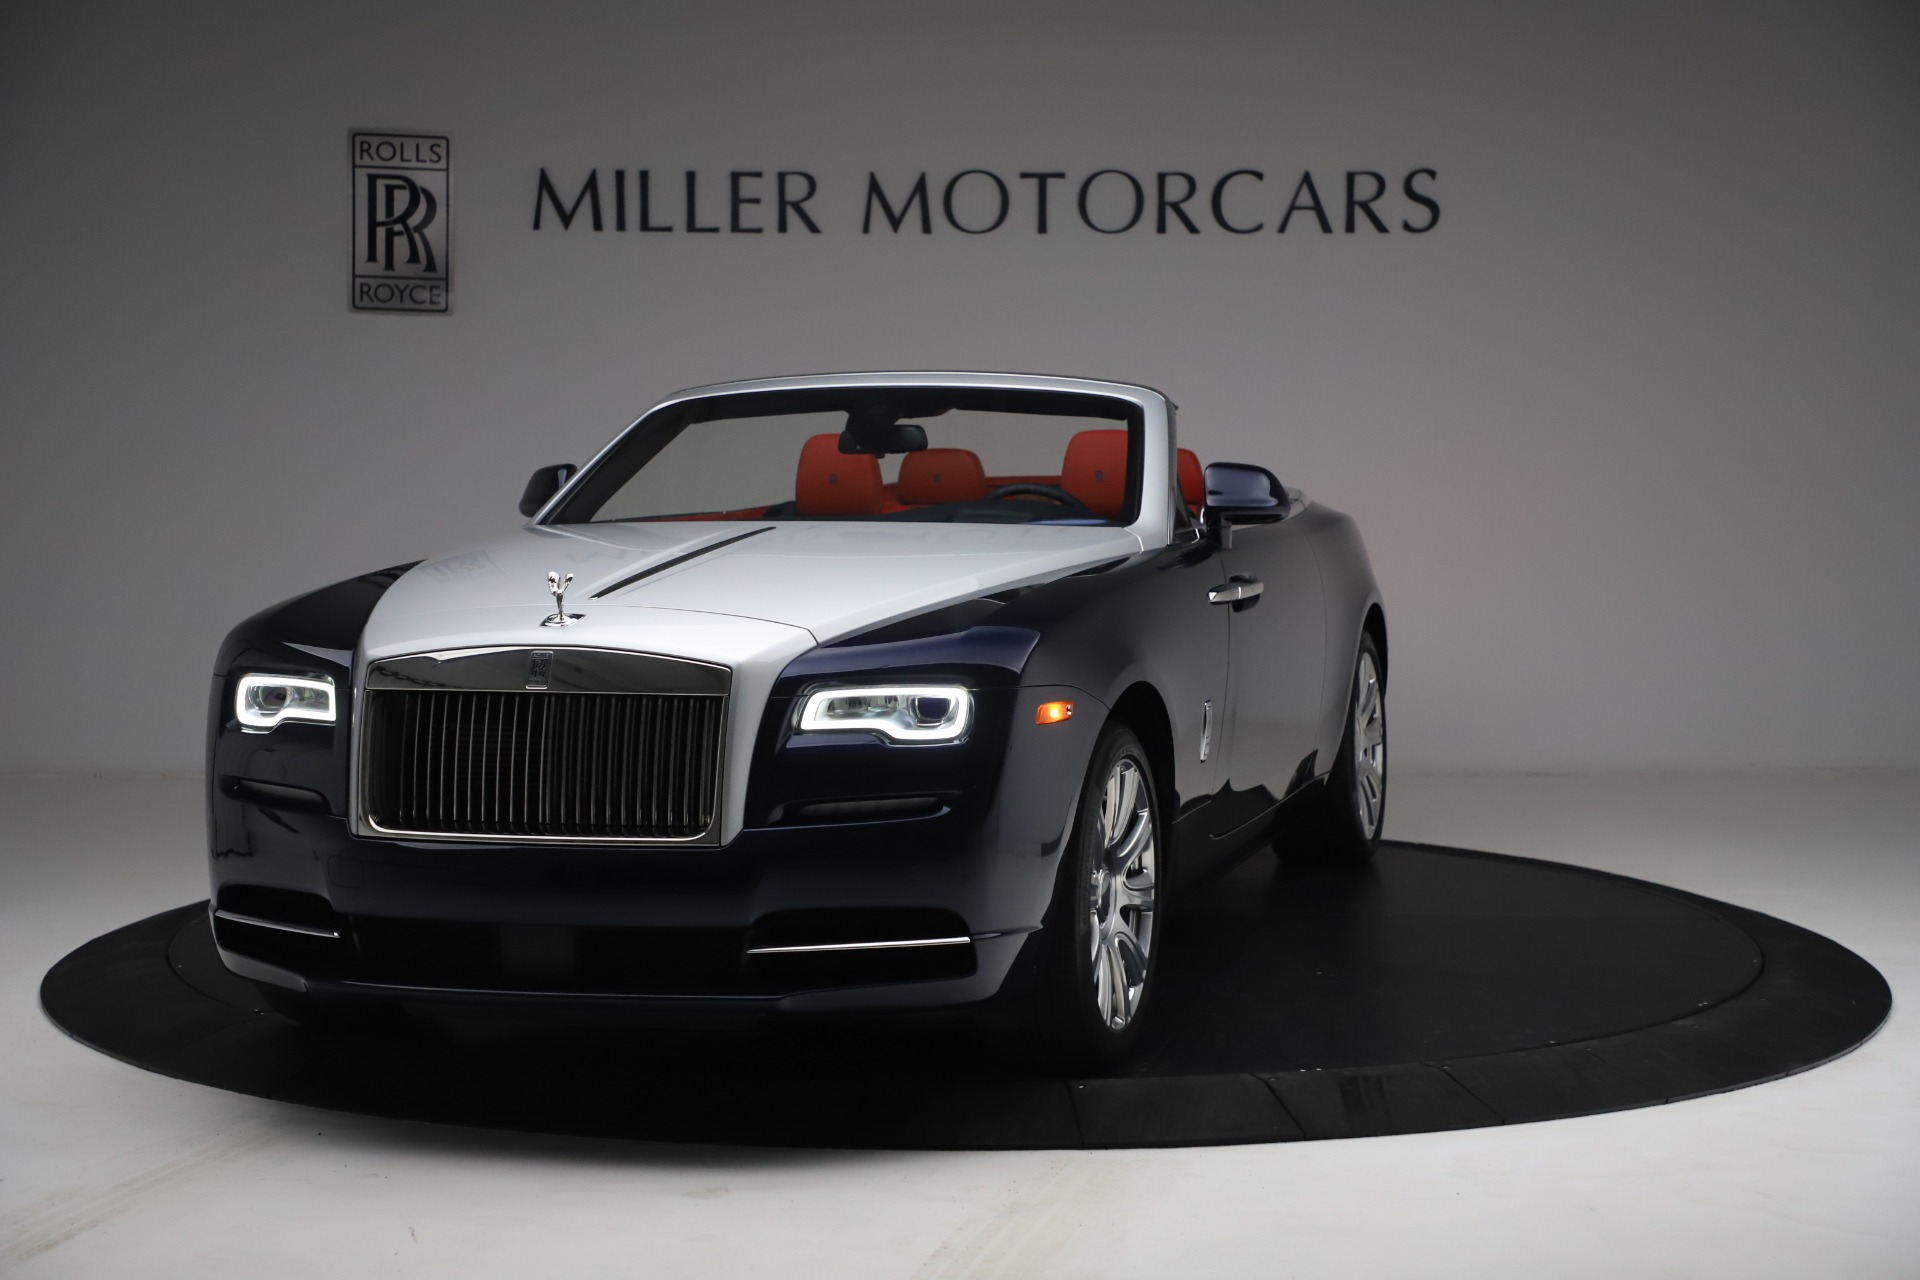 Used 2016 Rolls-Royce Dawn for sale $269,900 at Bugatti of Greenwich in Greenwich CT 06830 1